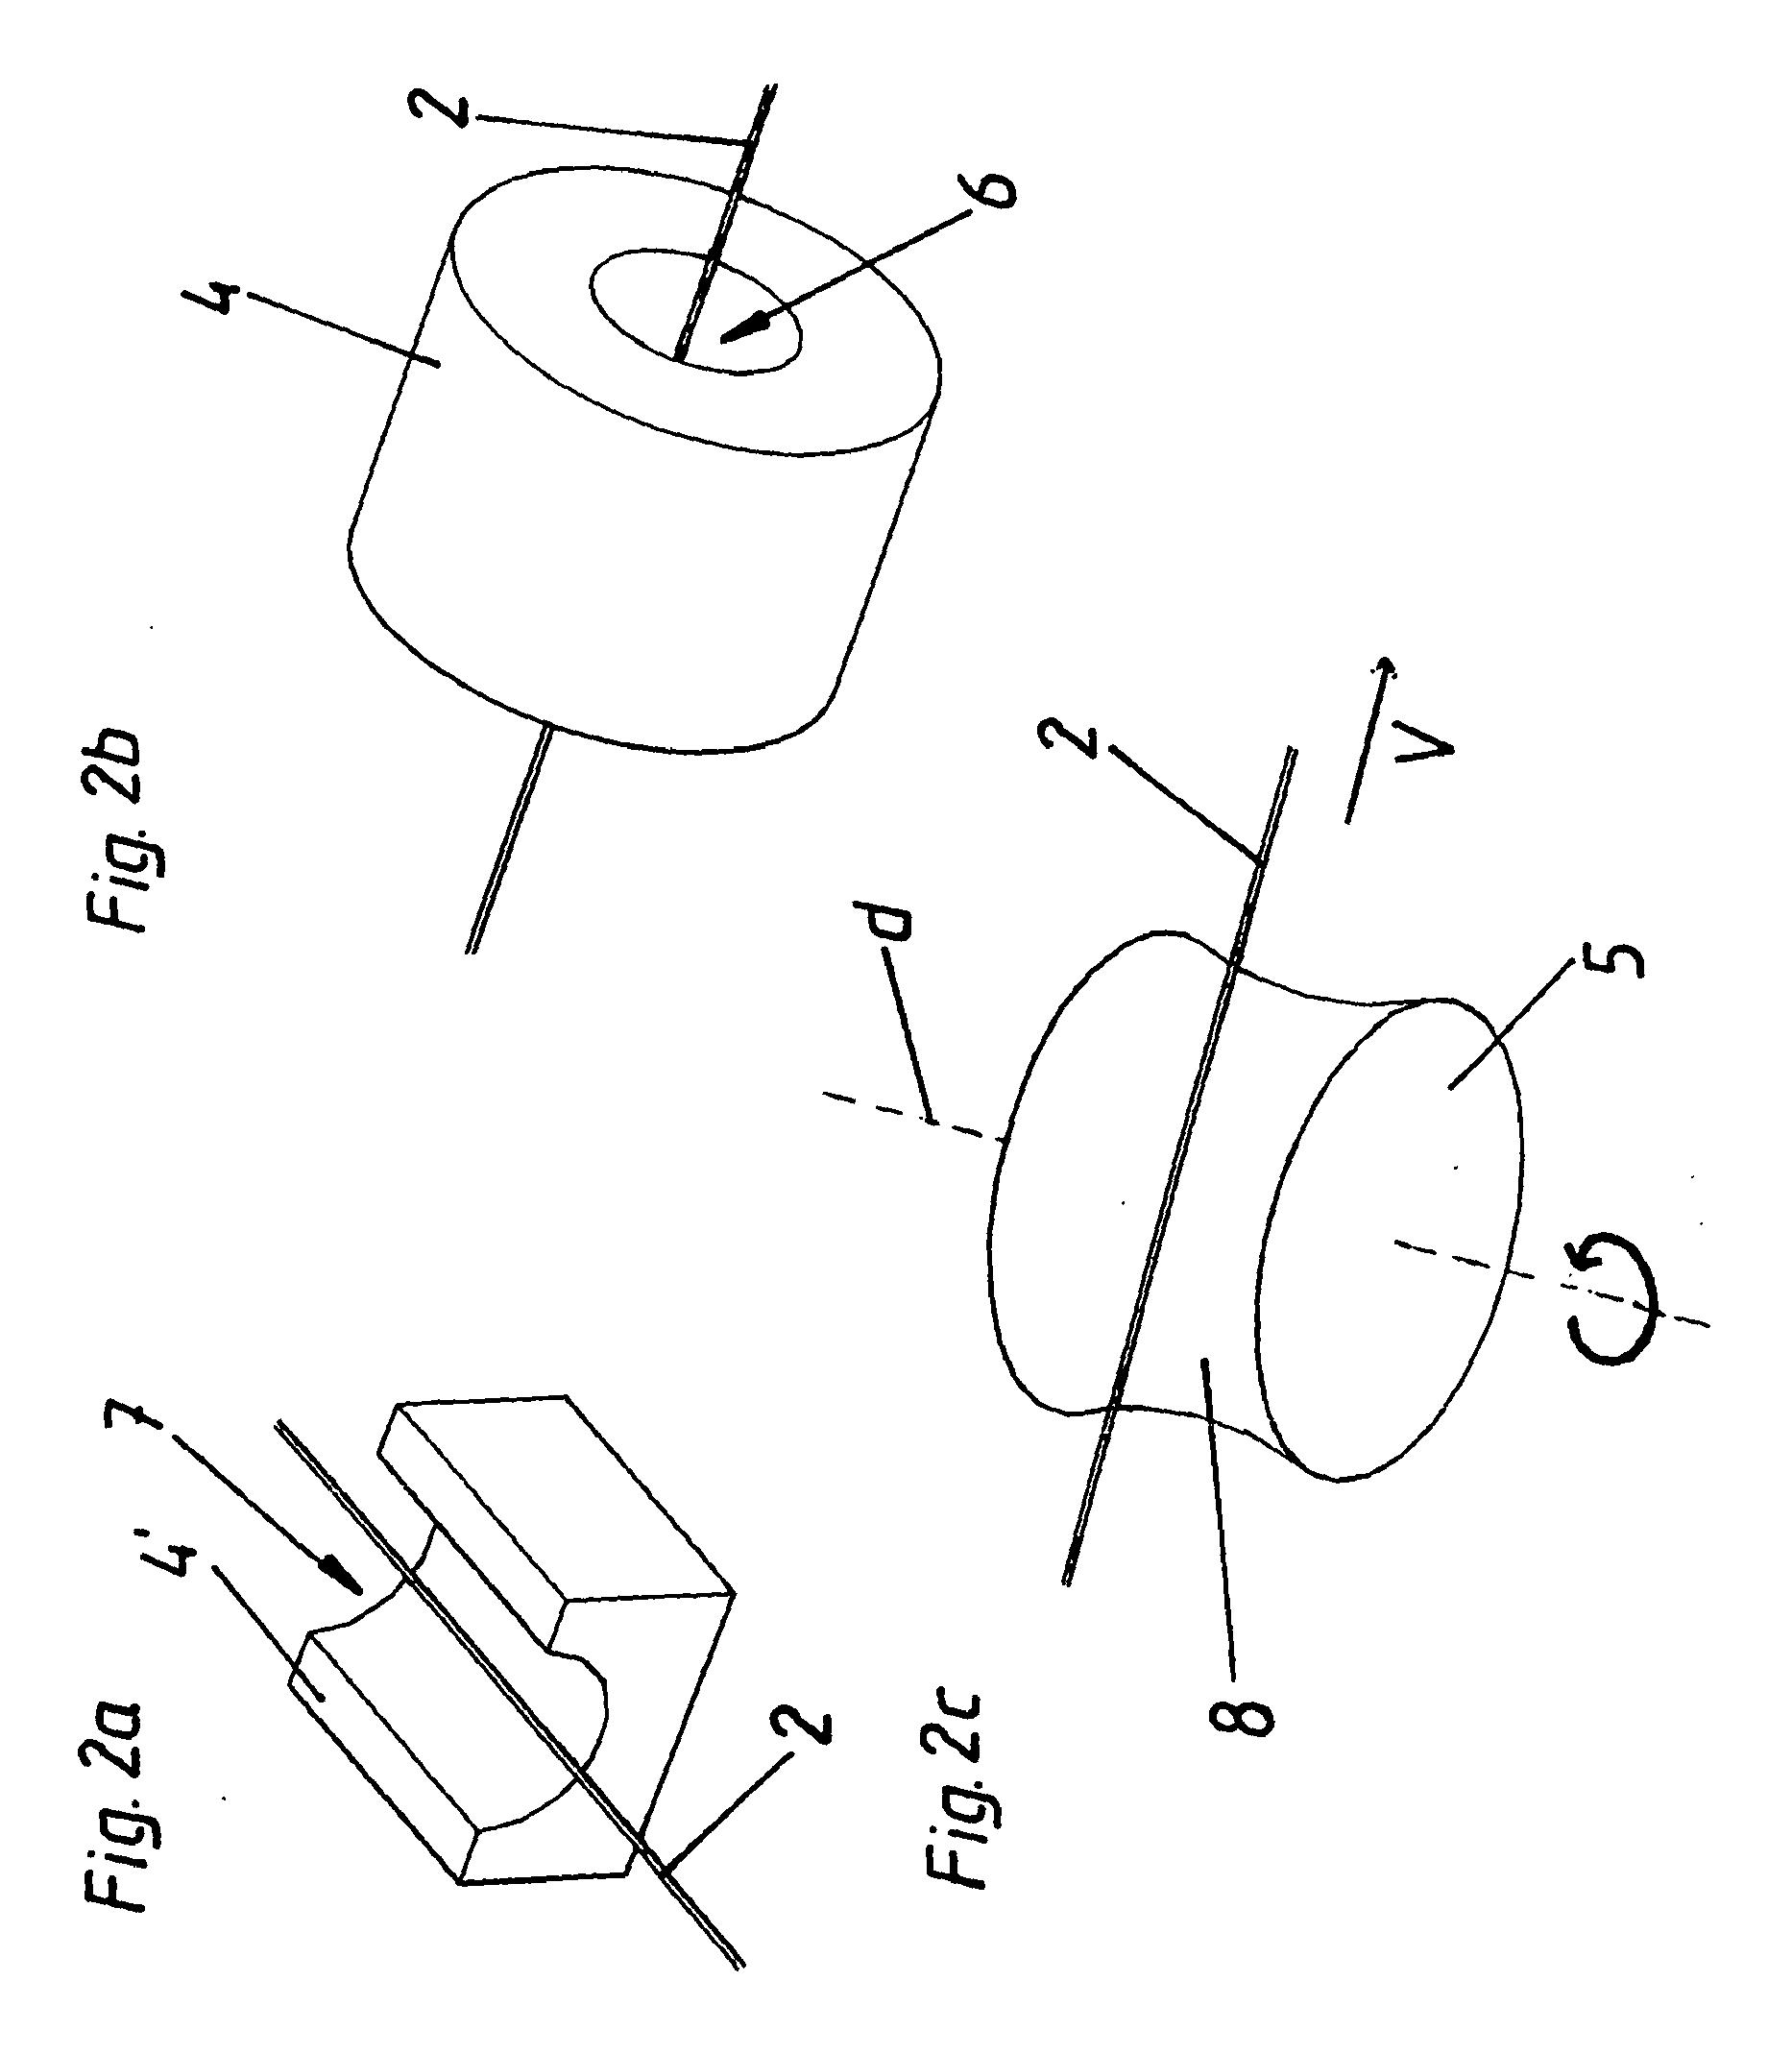 Tp 120 To 3 5mm Wiring Diagram - Wiring Diagrams Ja Headset Wiring Diagram on